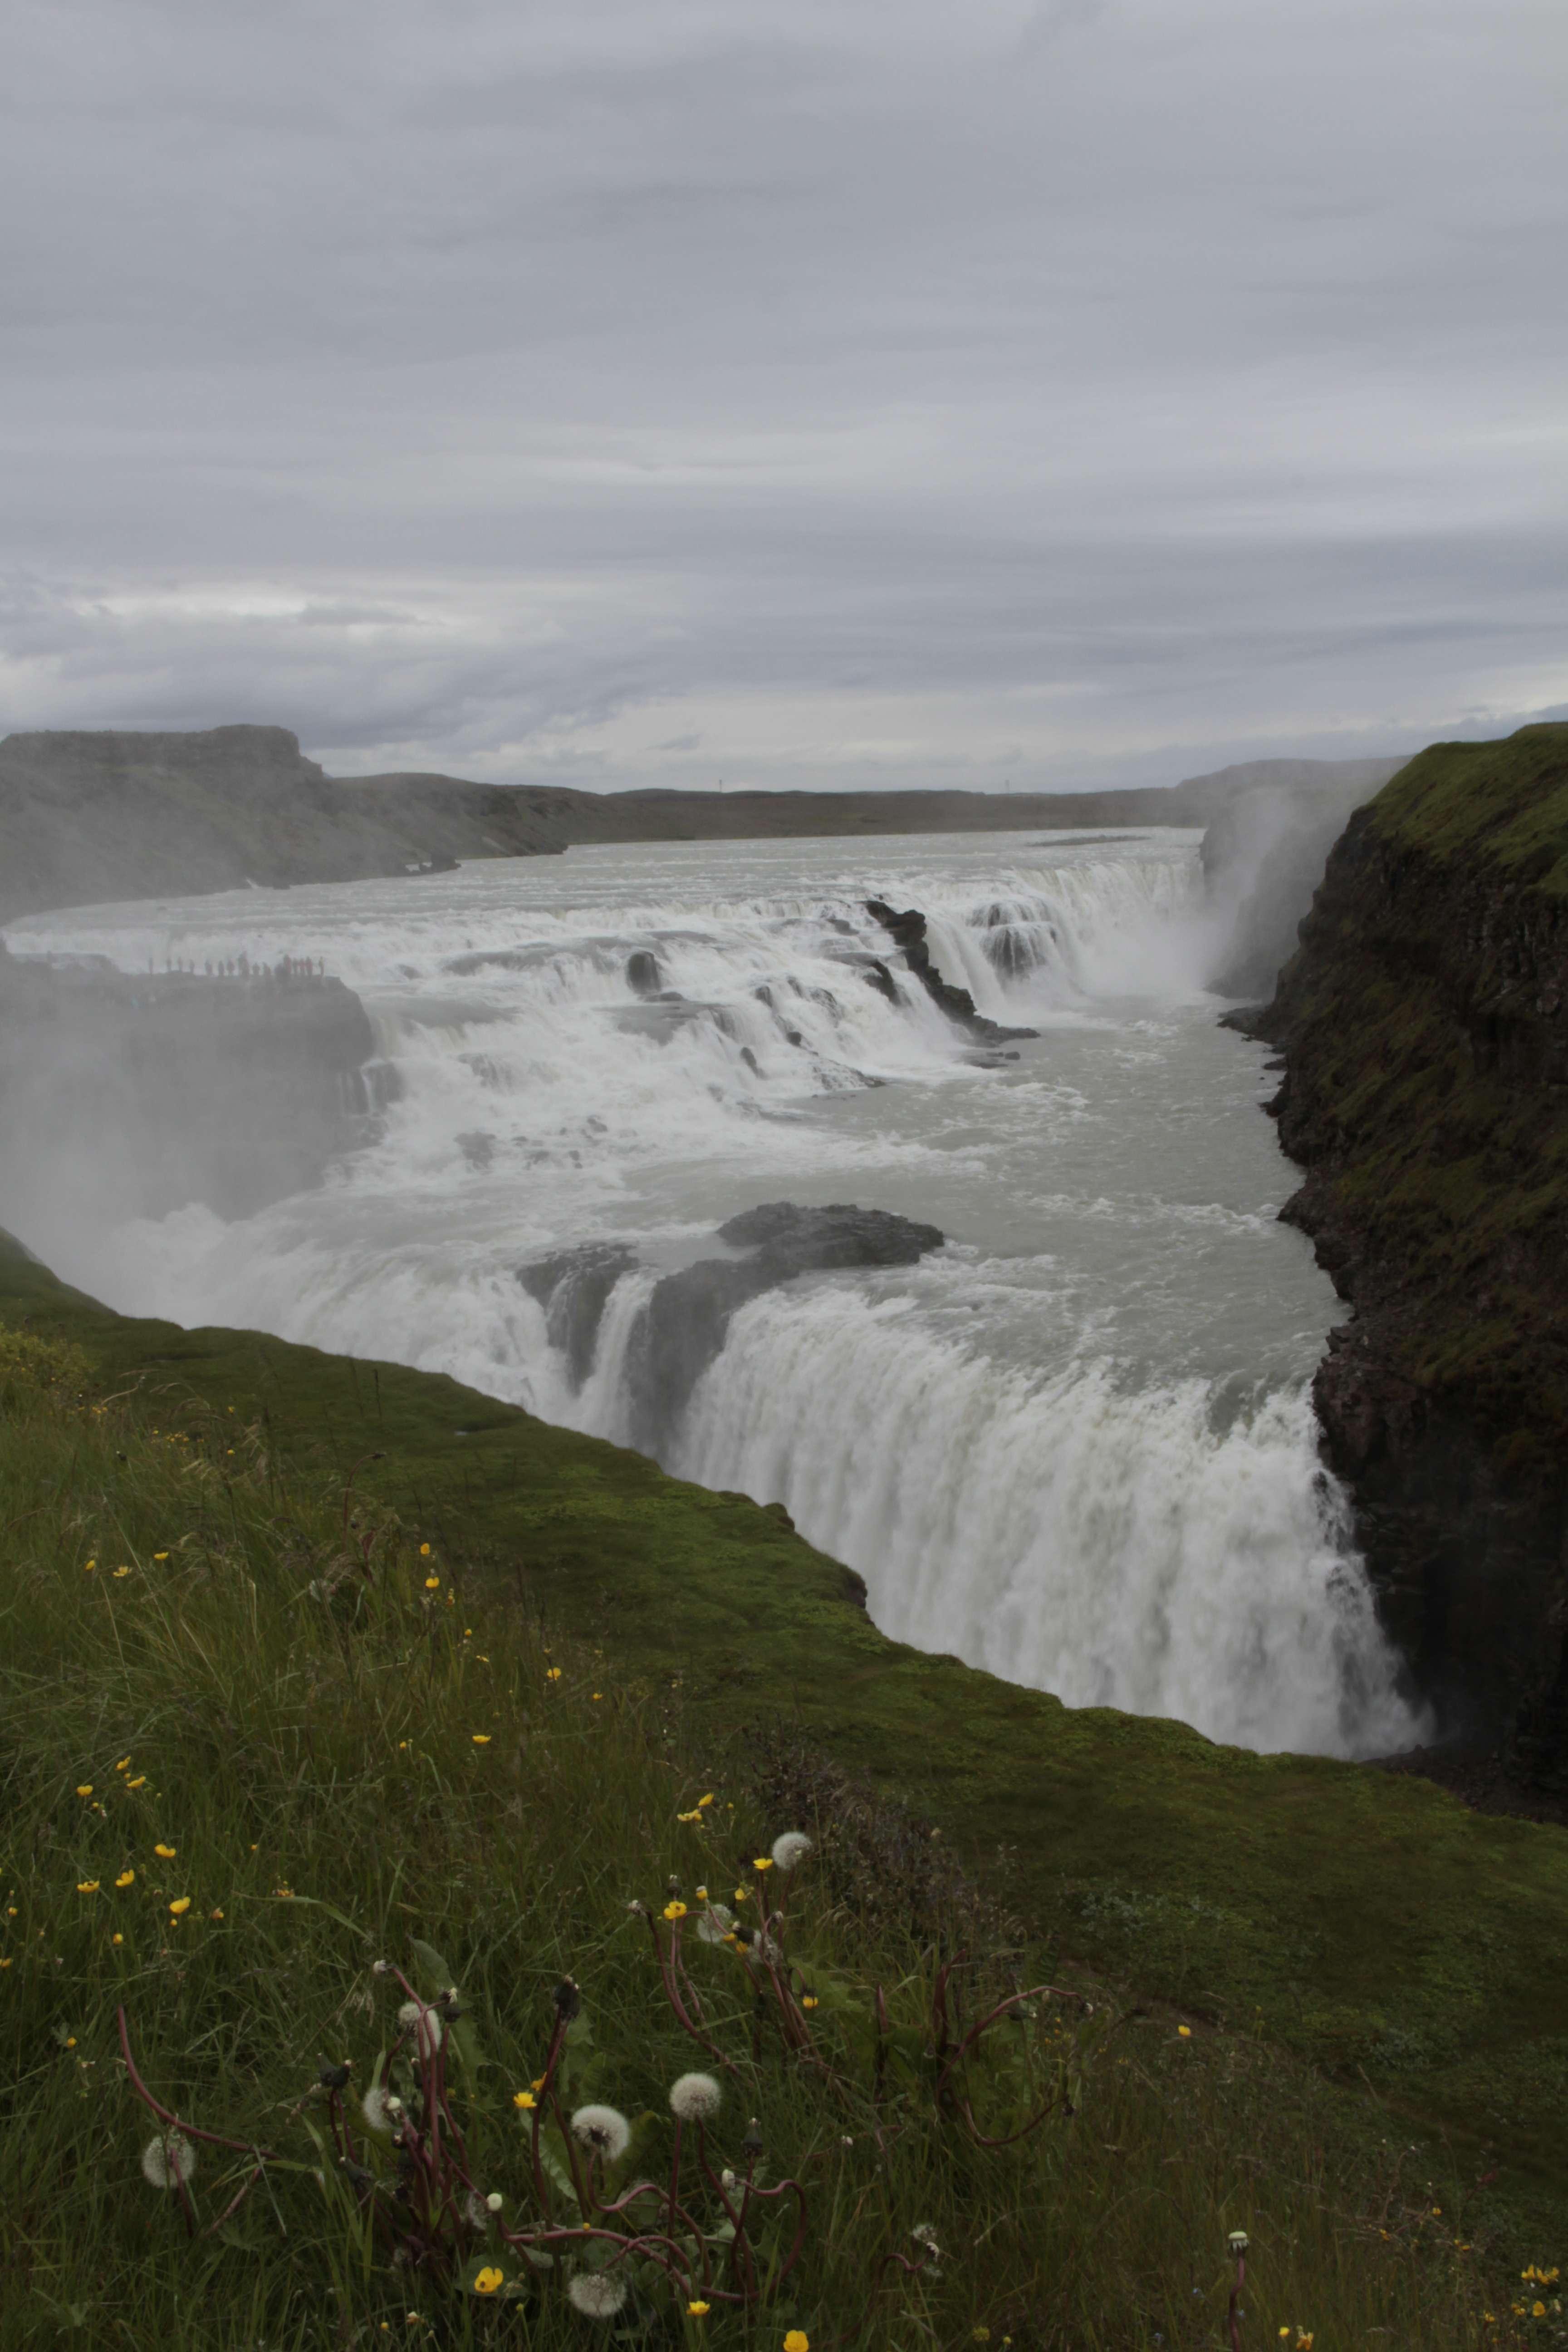 Islande_0060 gulfoss 9 juillet